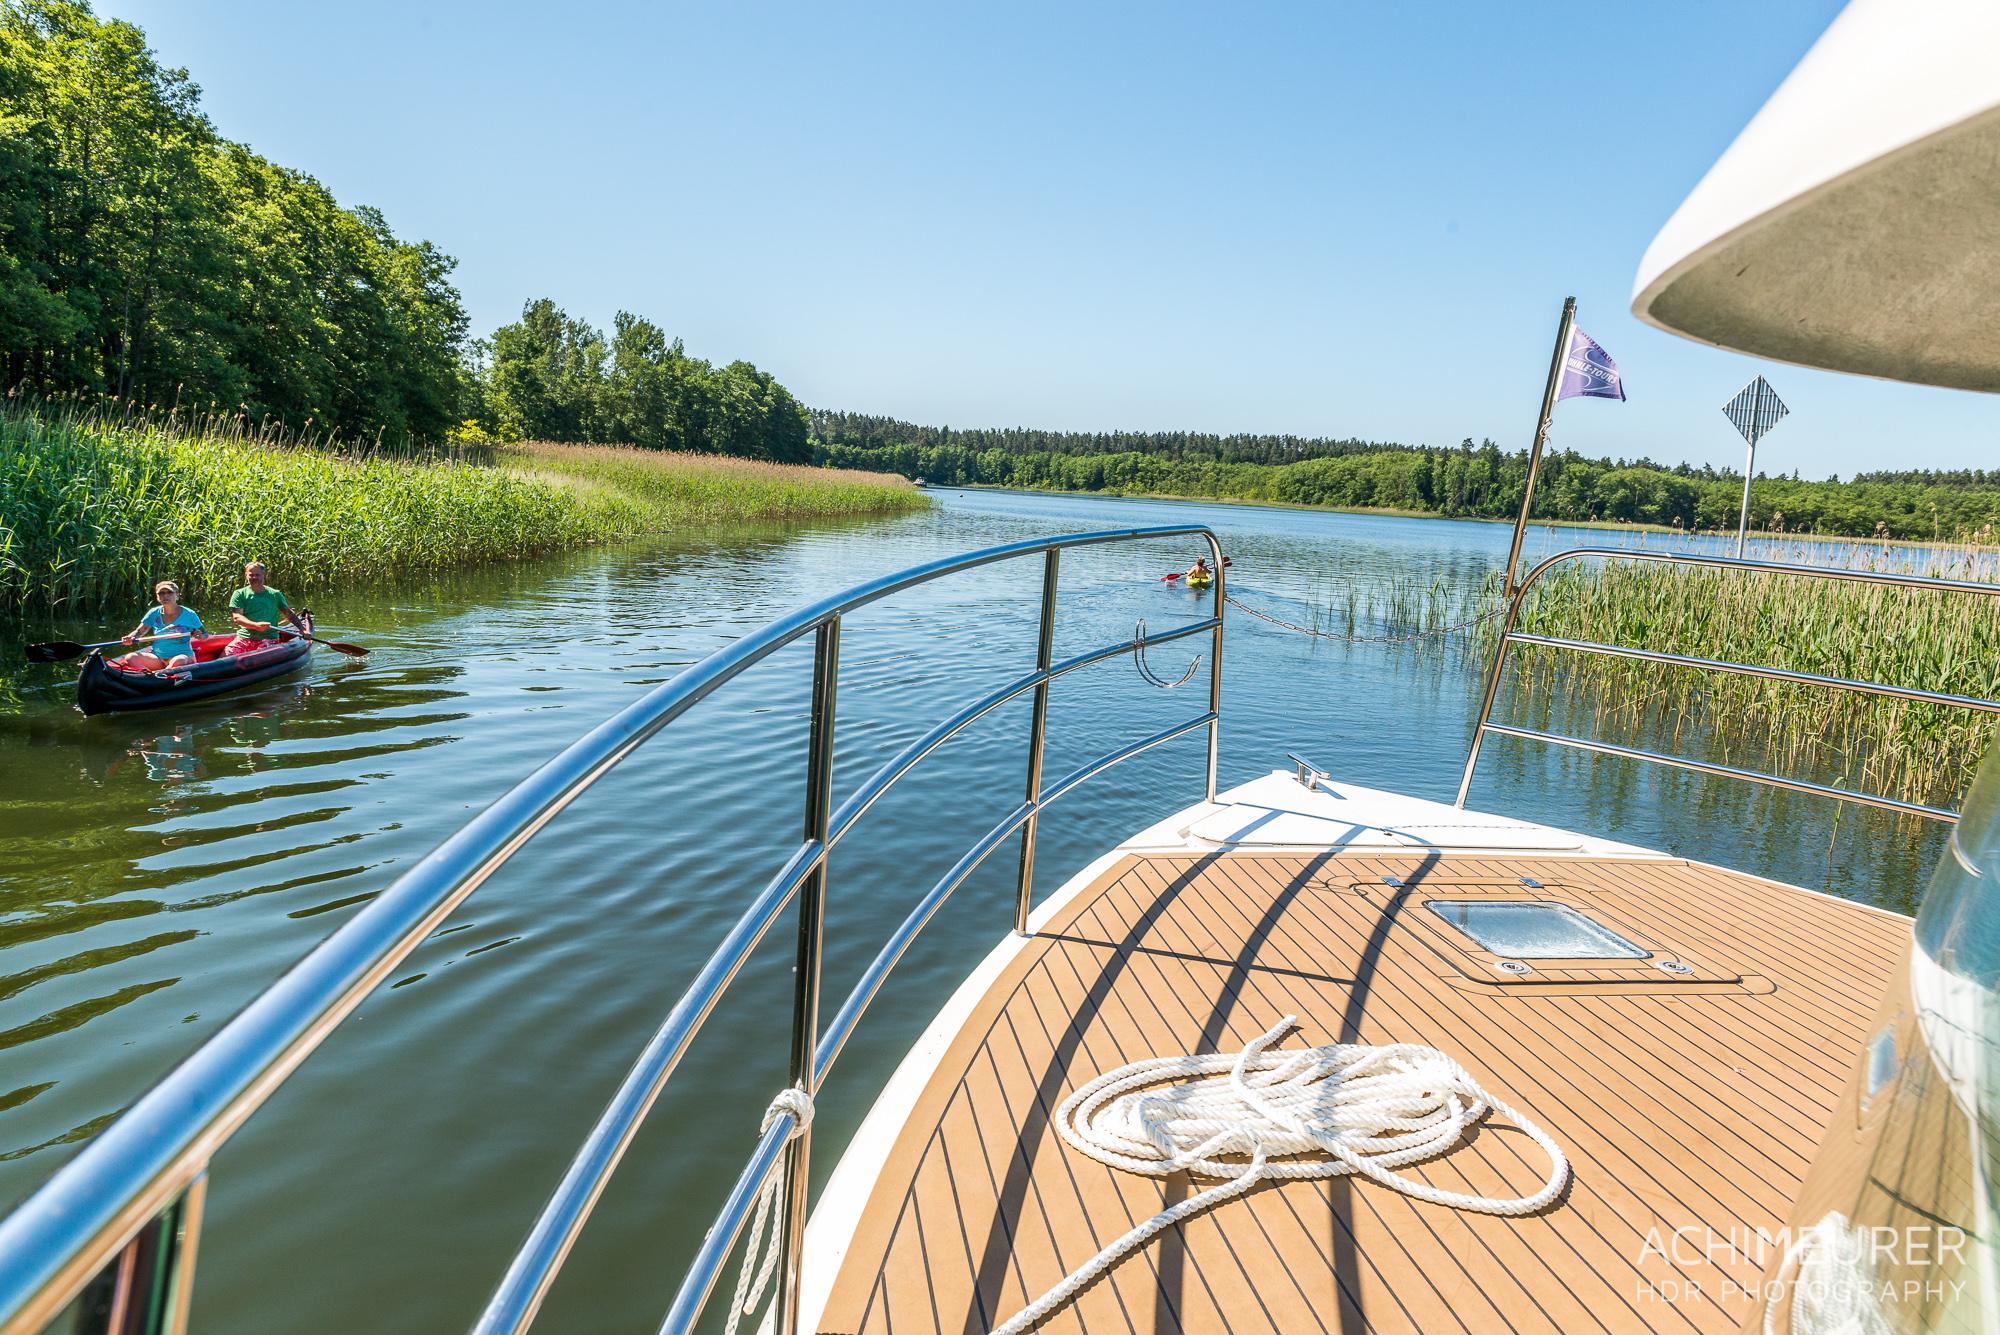 Hausboot-Kuhnle-Mueritz-Mecklenburg-Vorpommern-See_3139